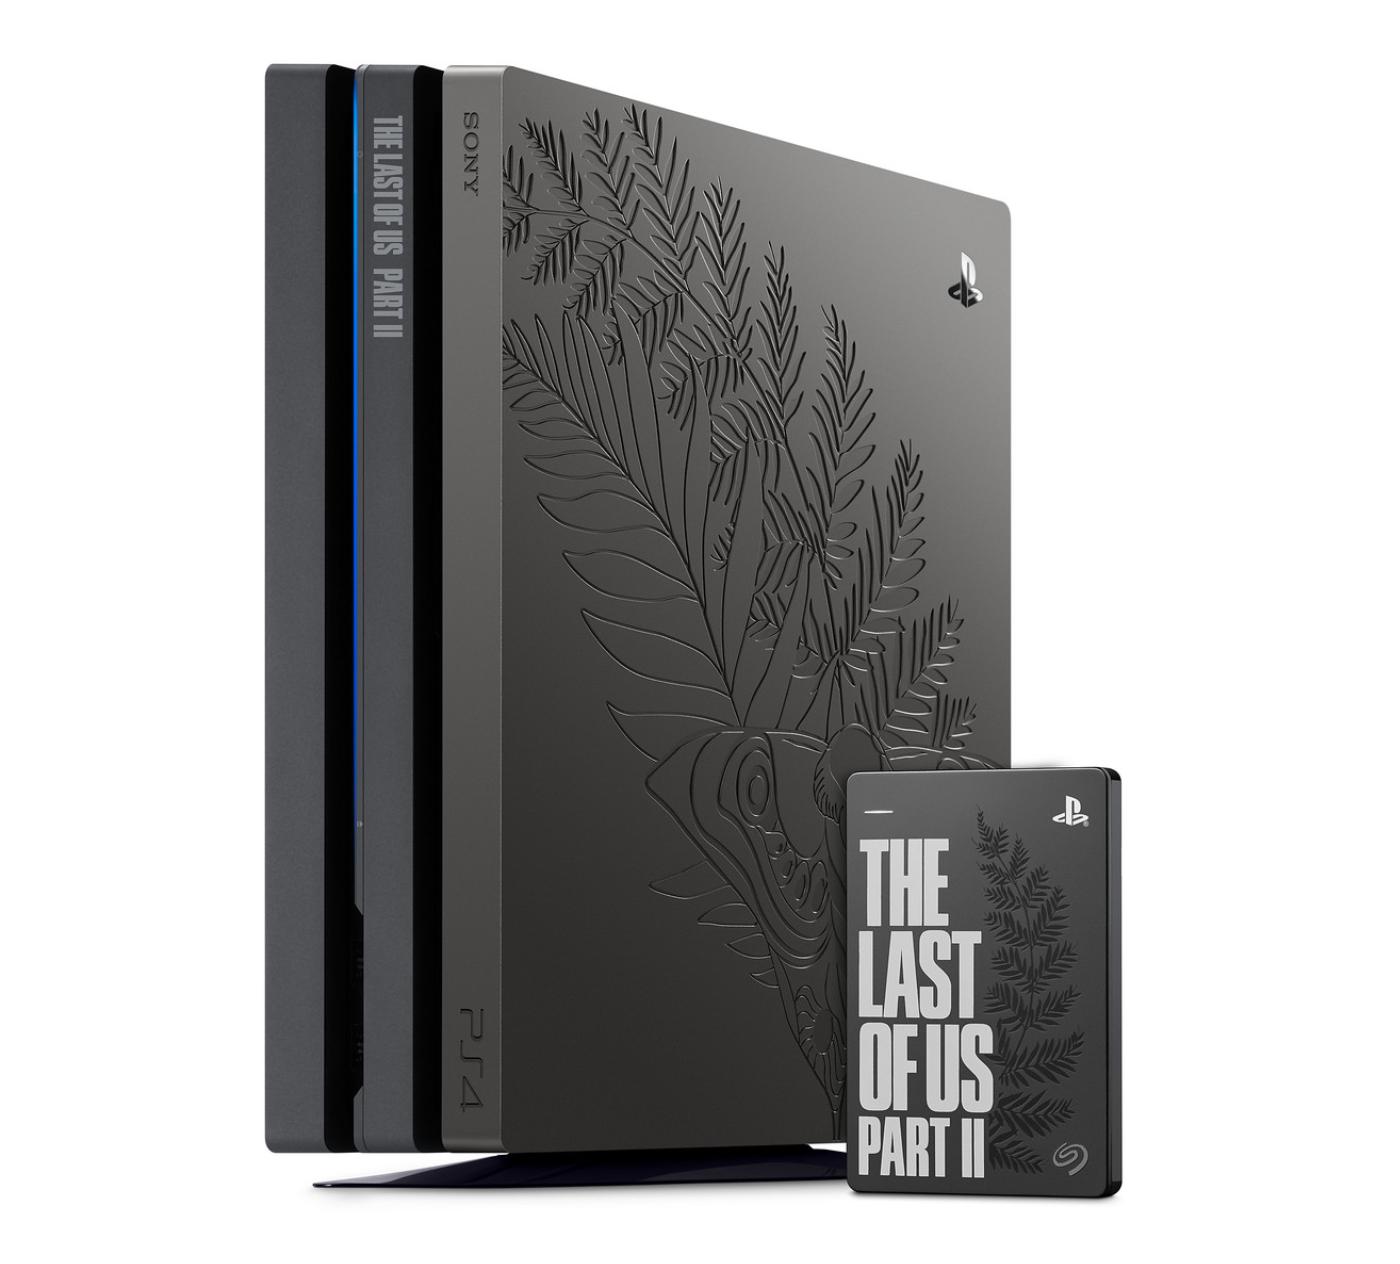 The Last of Us Part II hard drive